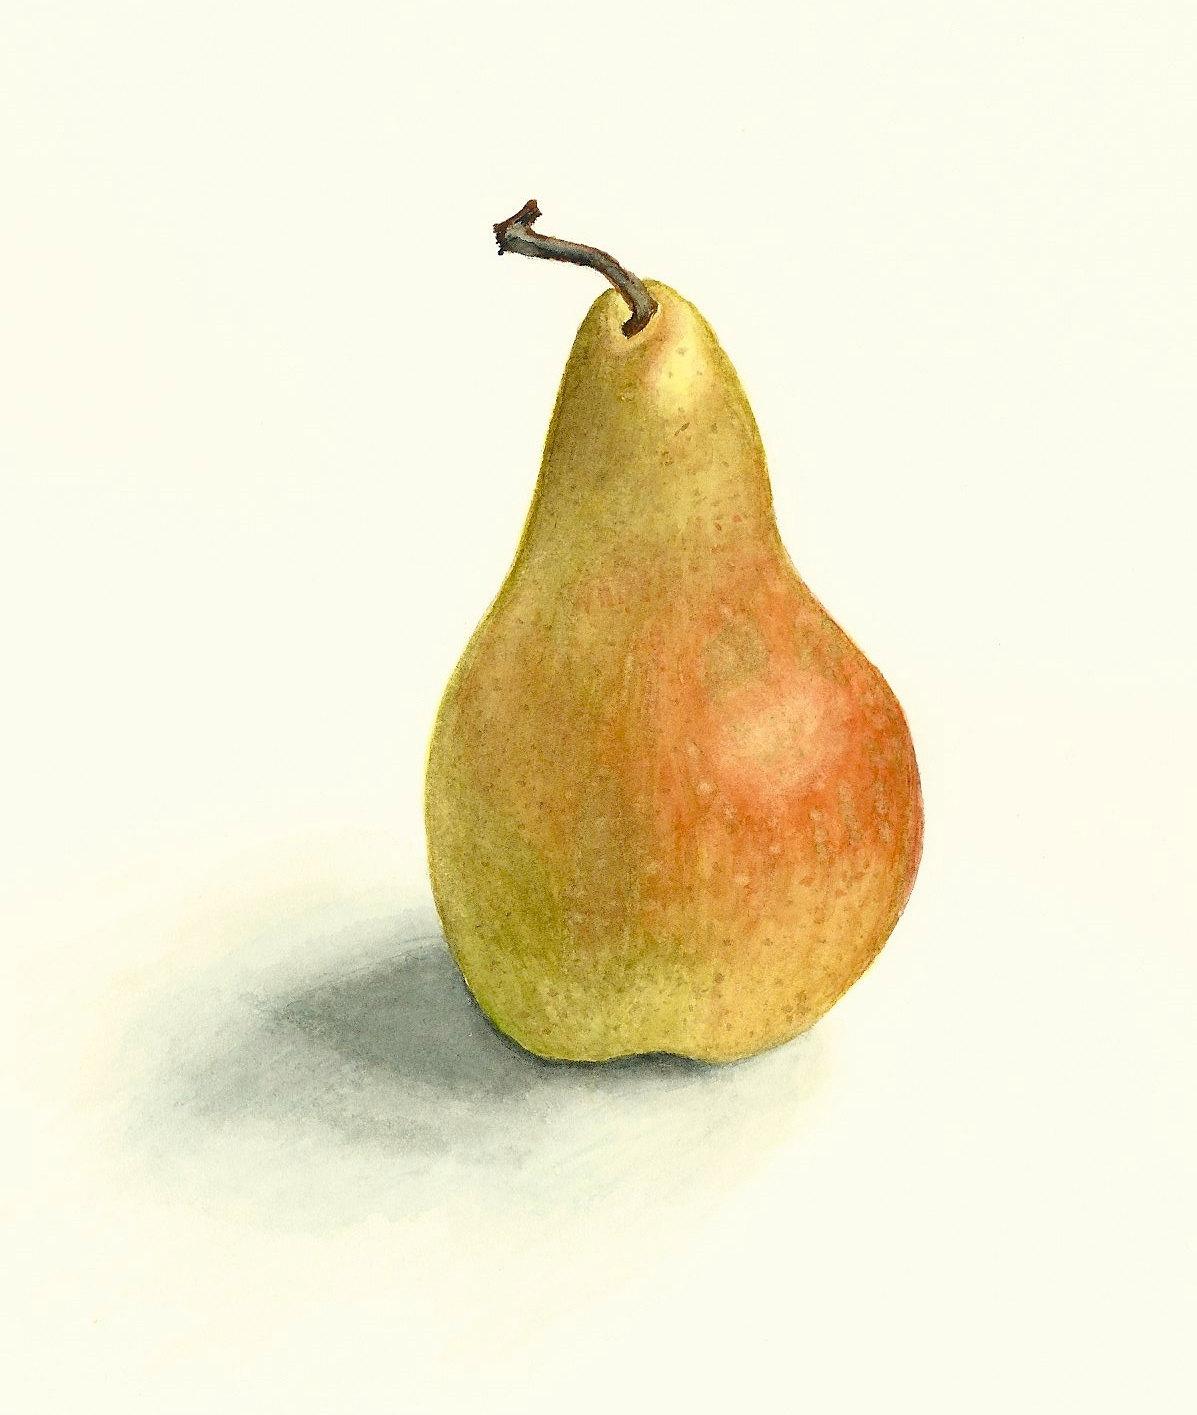 Original Realistic Pear Watercolor Digital Print 6x8 on Acid